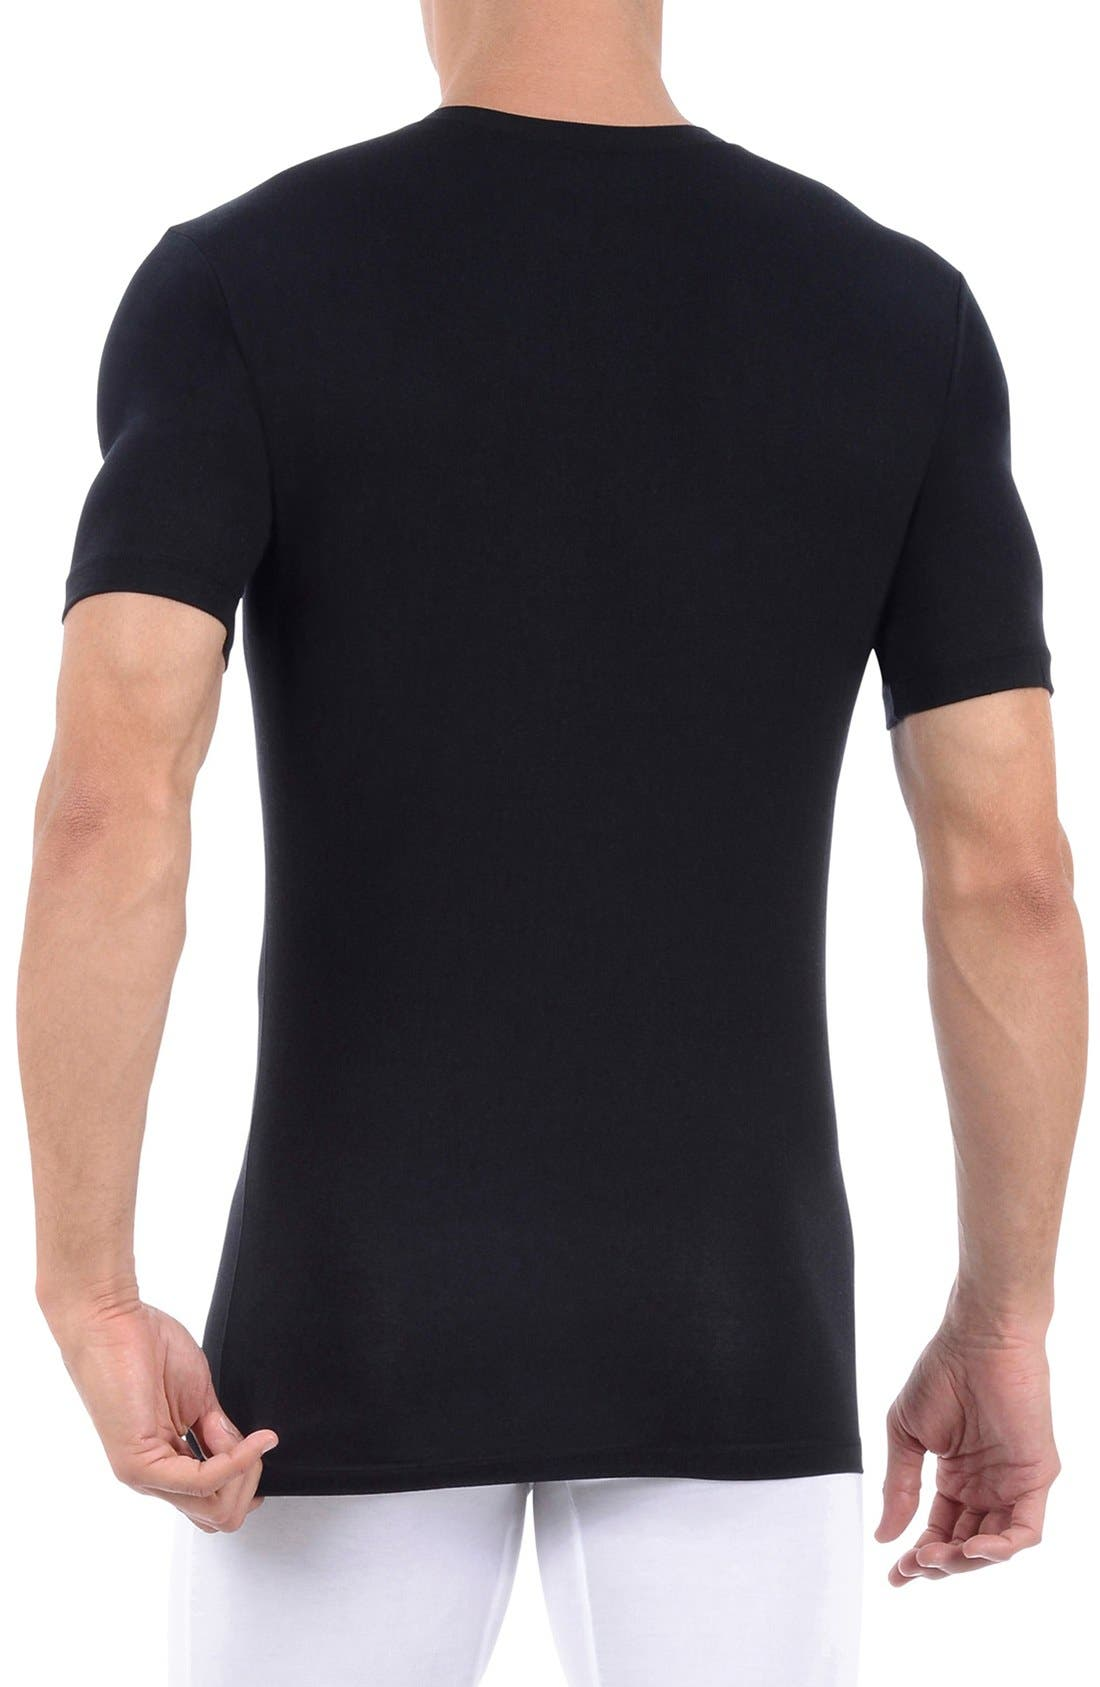 Alternate Image 2  - Tommy John 'Second Skin' Deep V-Neck Undershirt